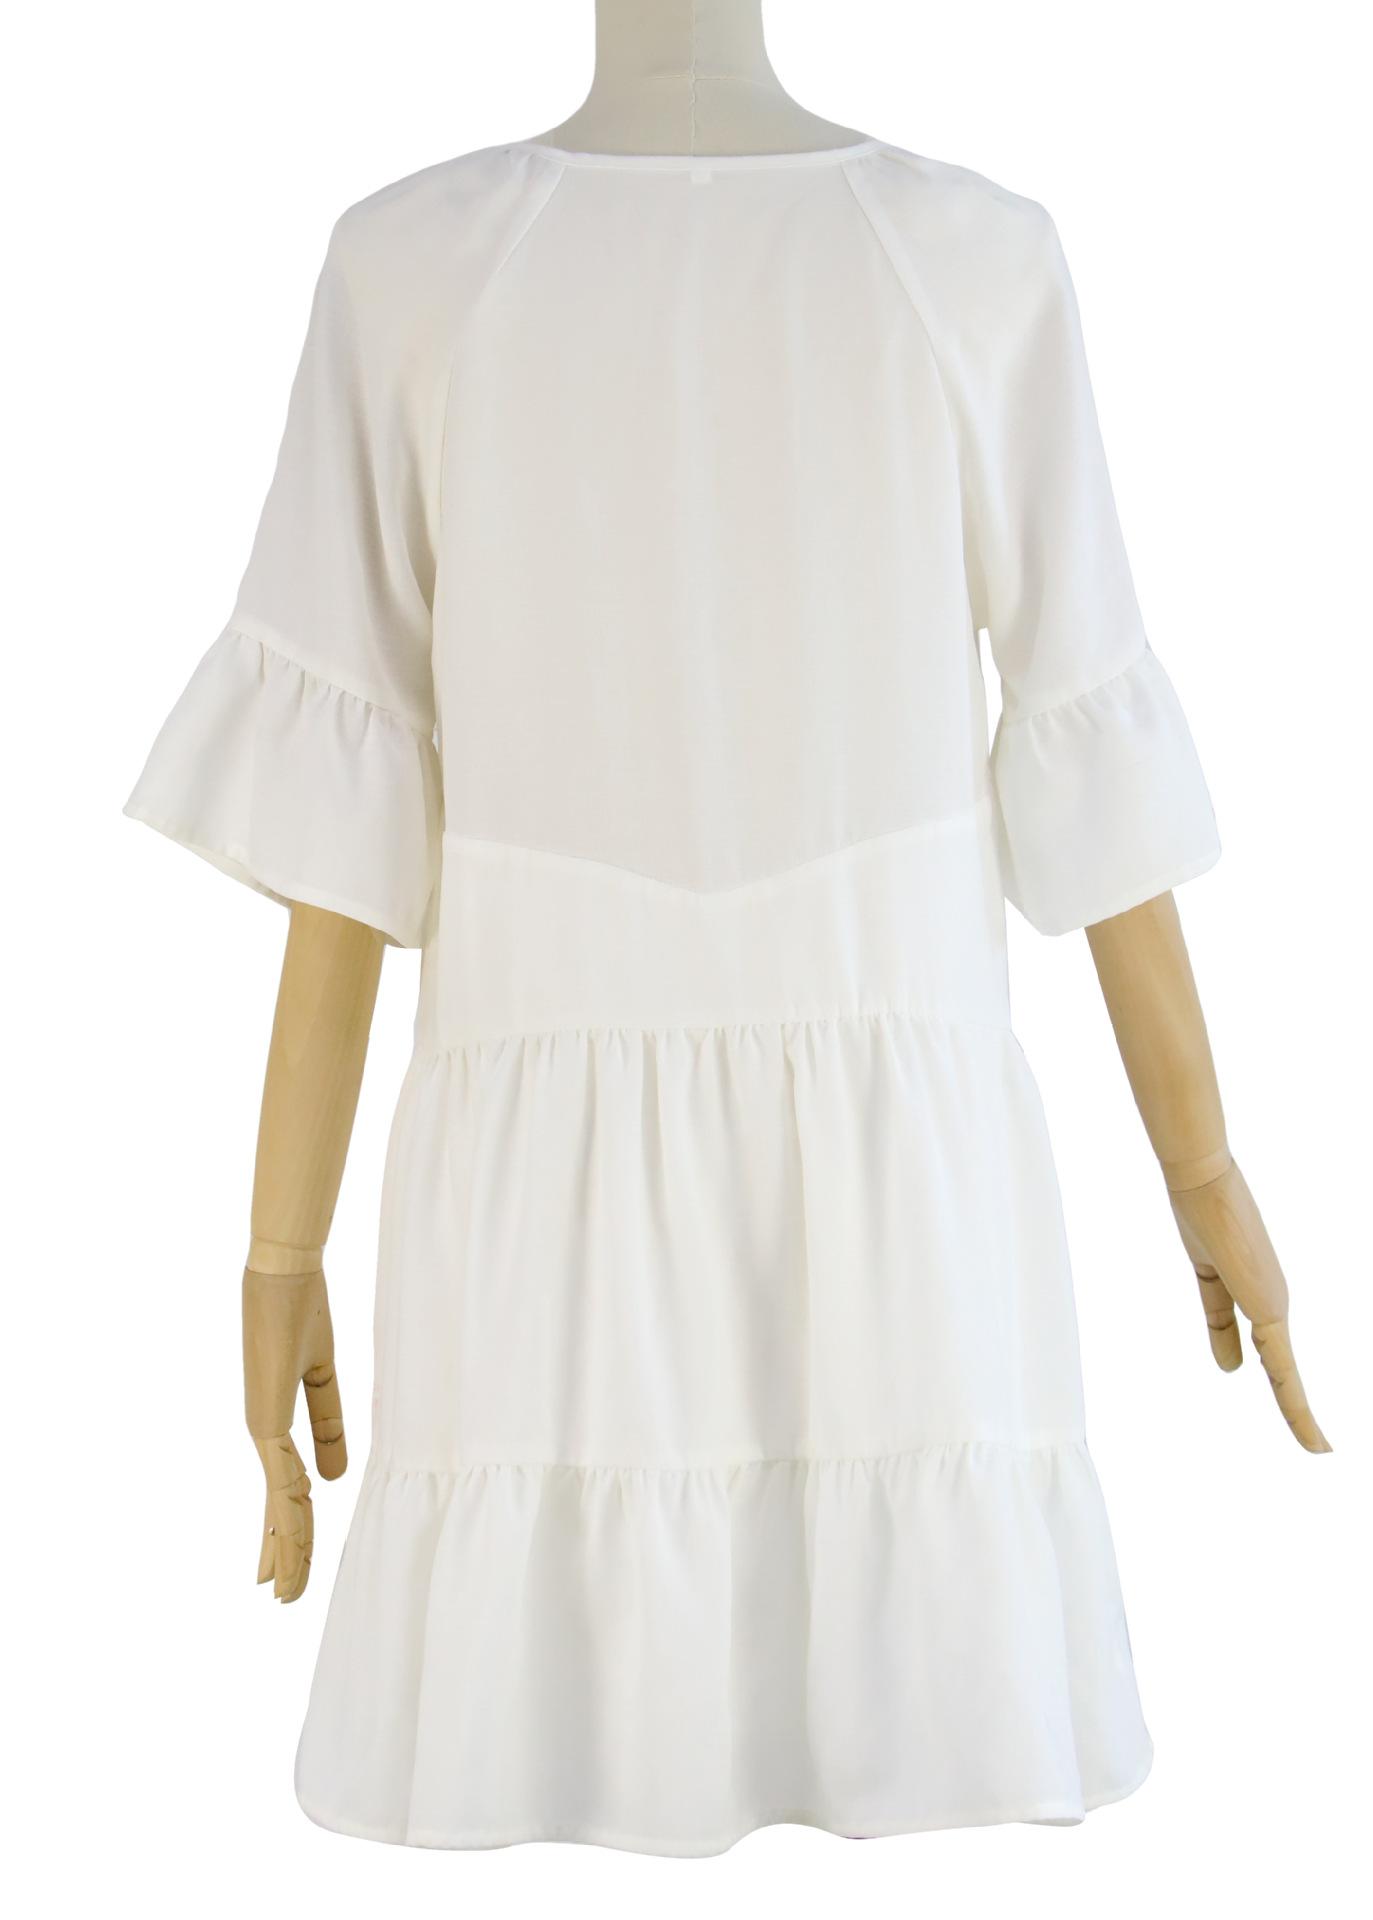 Factory Pricer Sexy Dress Paneled Ruffled White Fringe Neckline Summer Dress